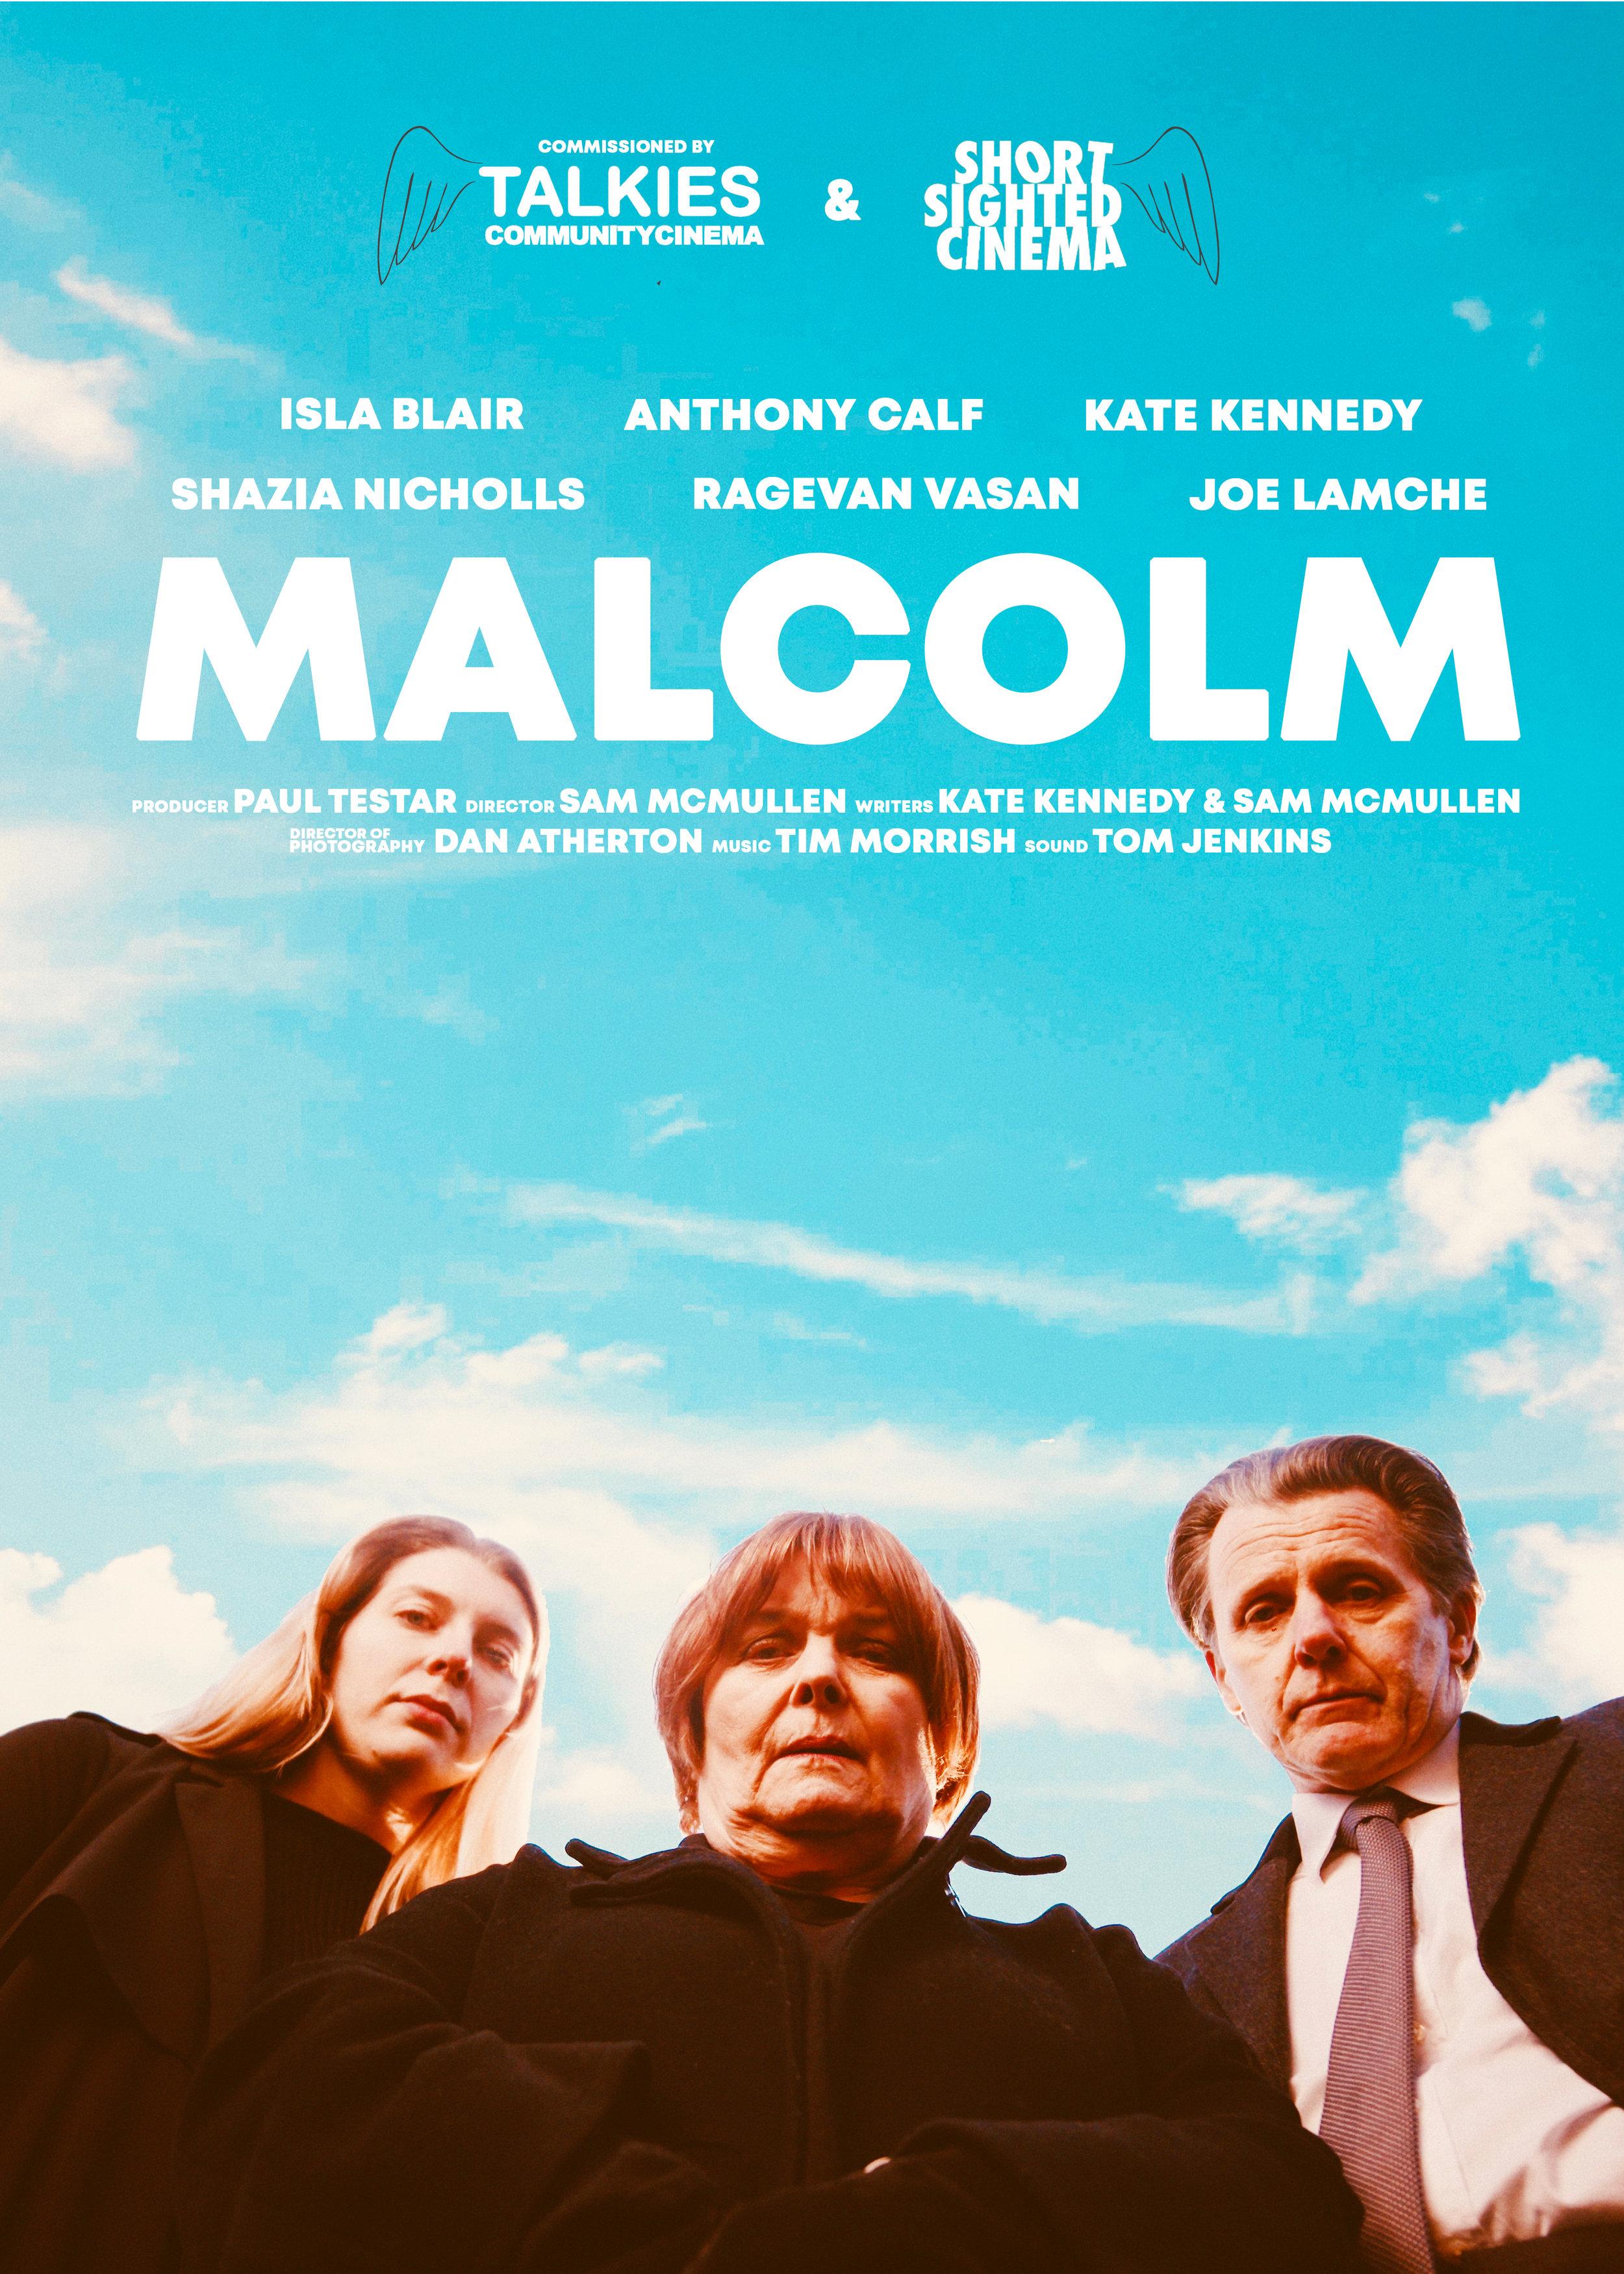 Malcolm Poster Final 2.jpg